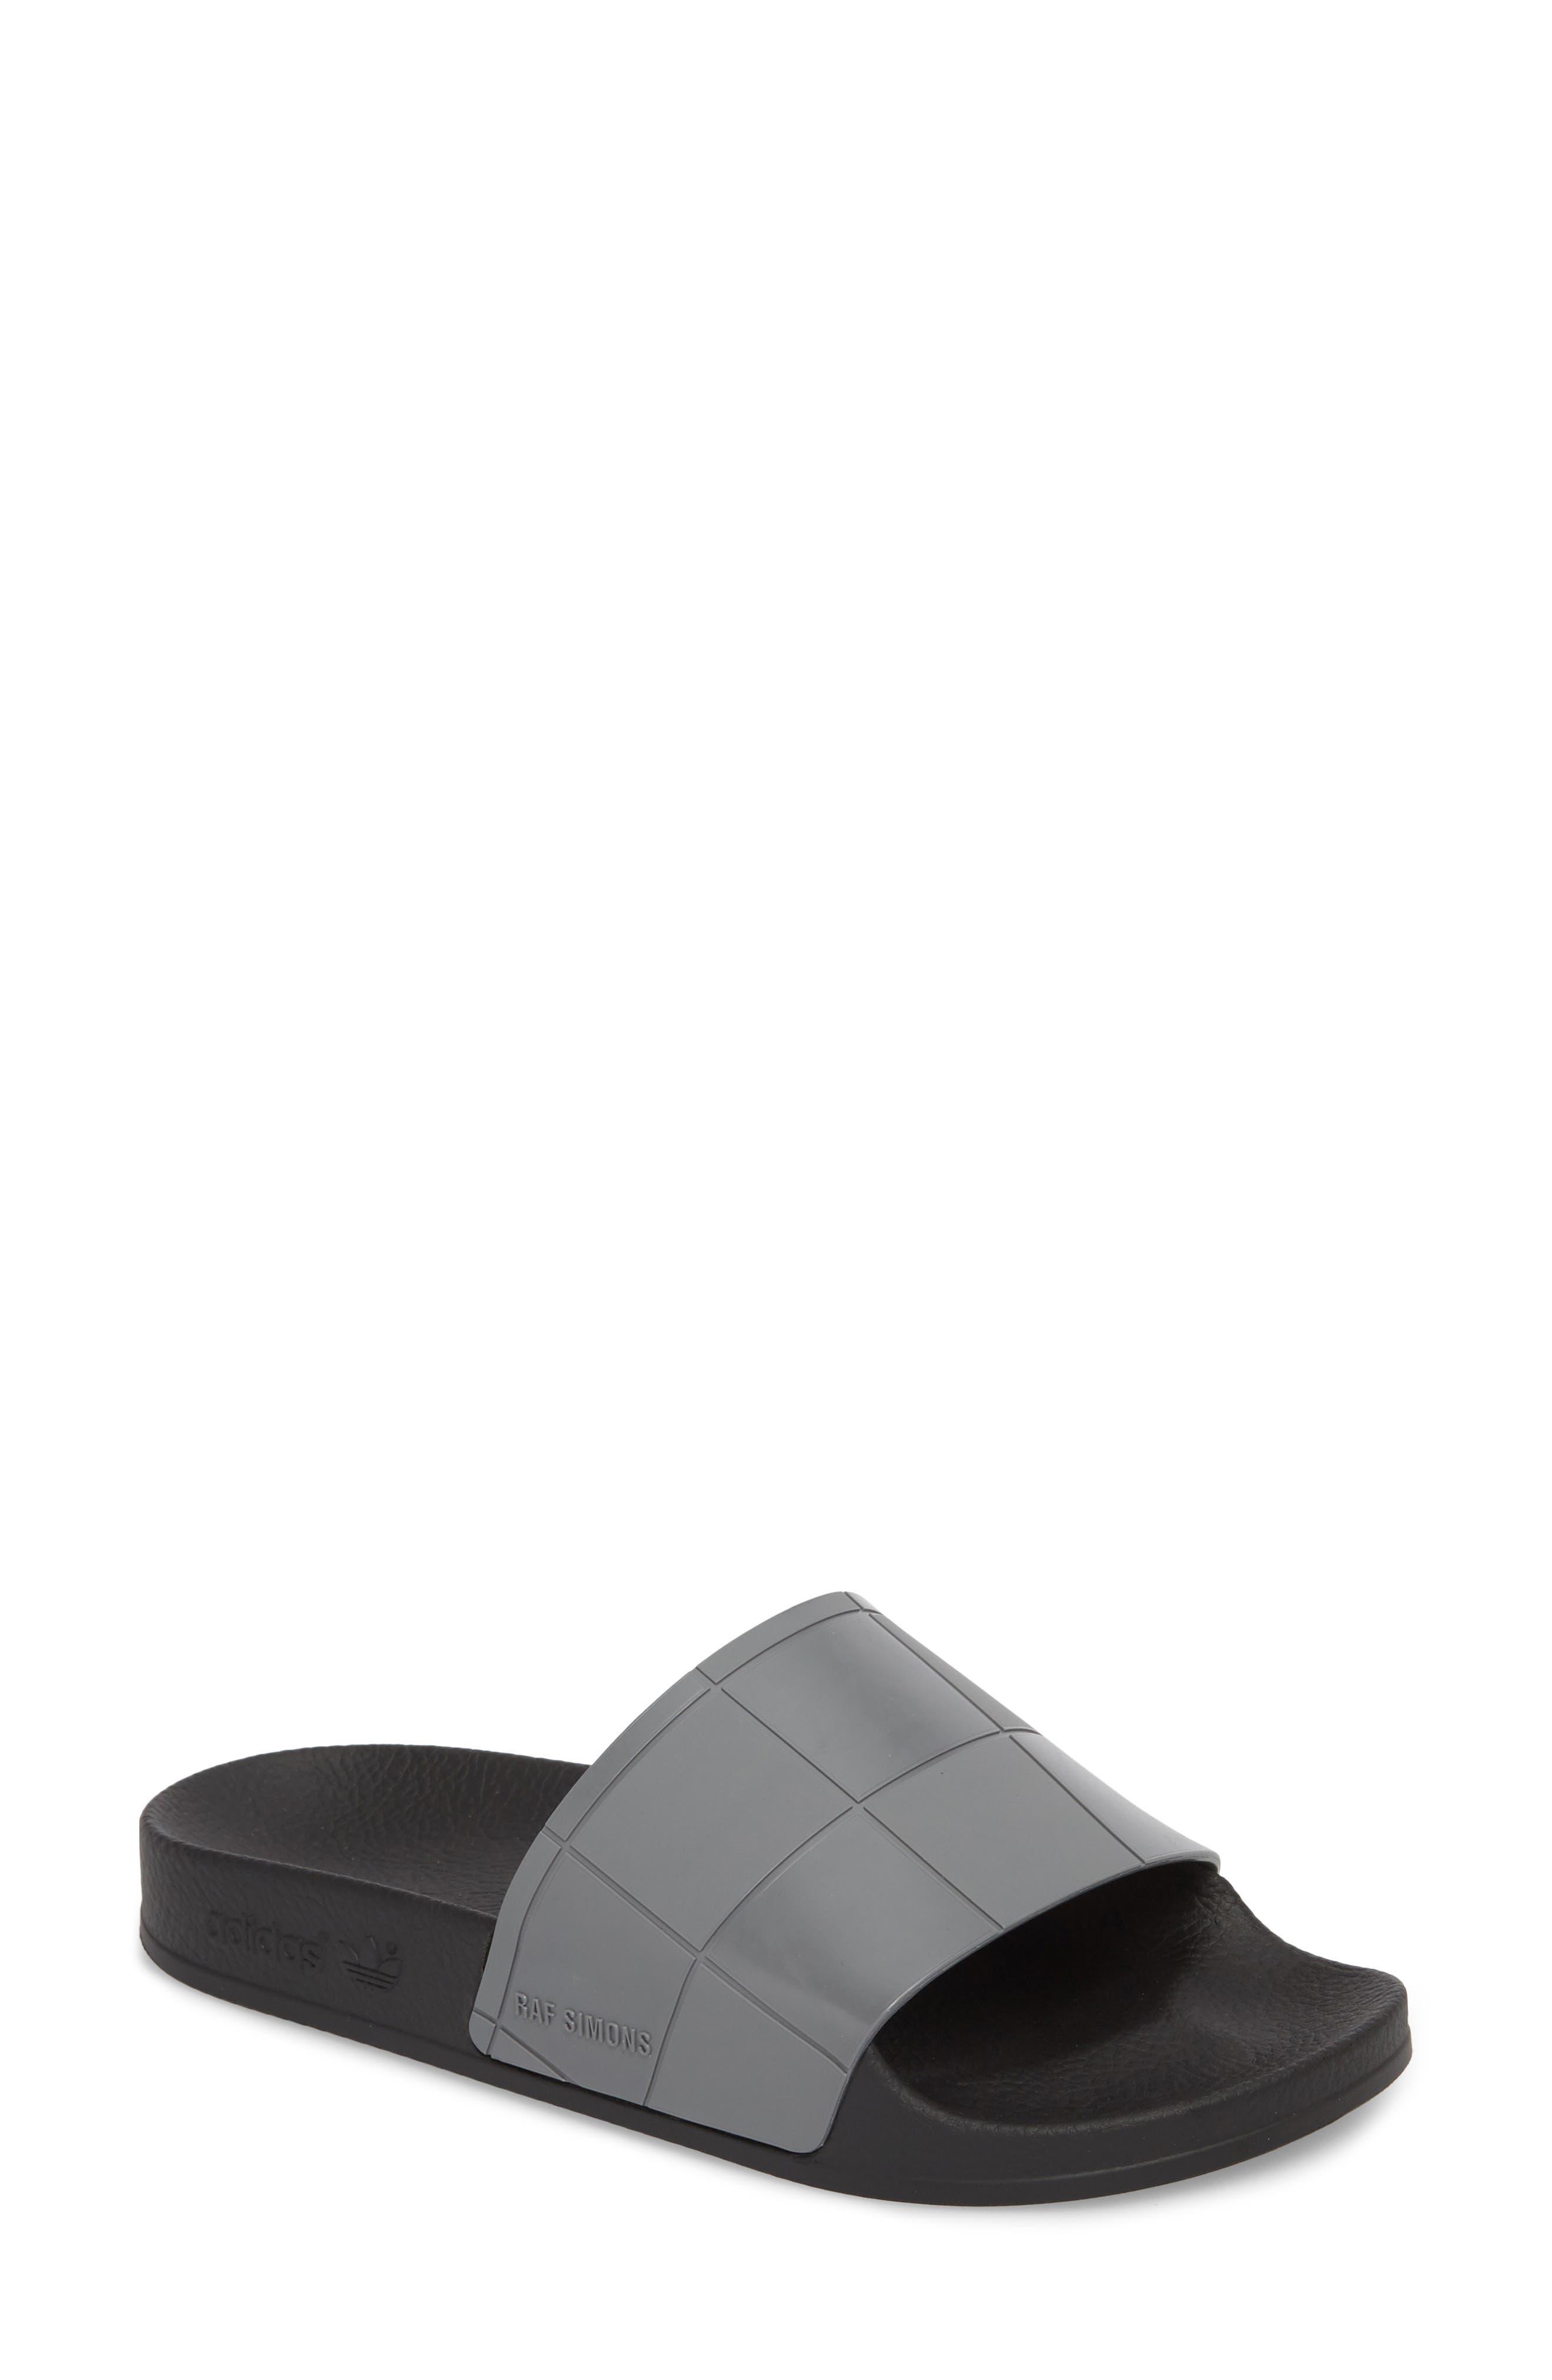 Adilette Slide Sandal,                         Main,                         color, Core Black/ Granite